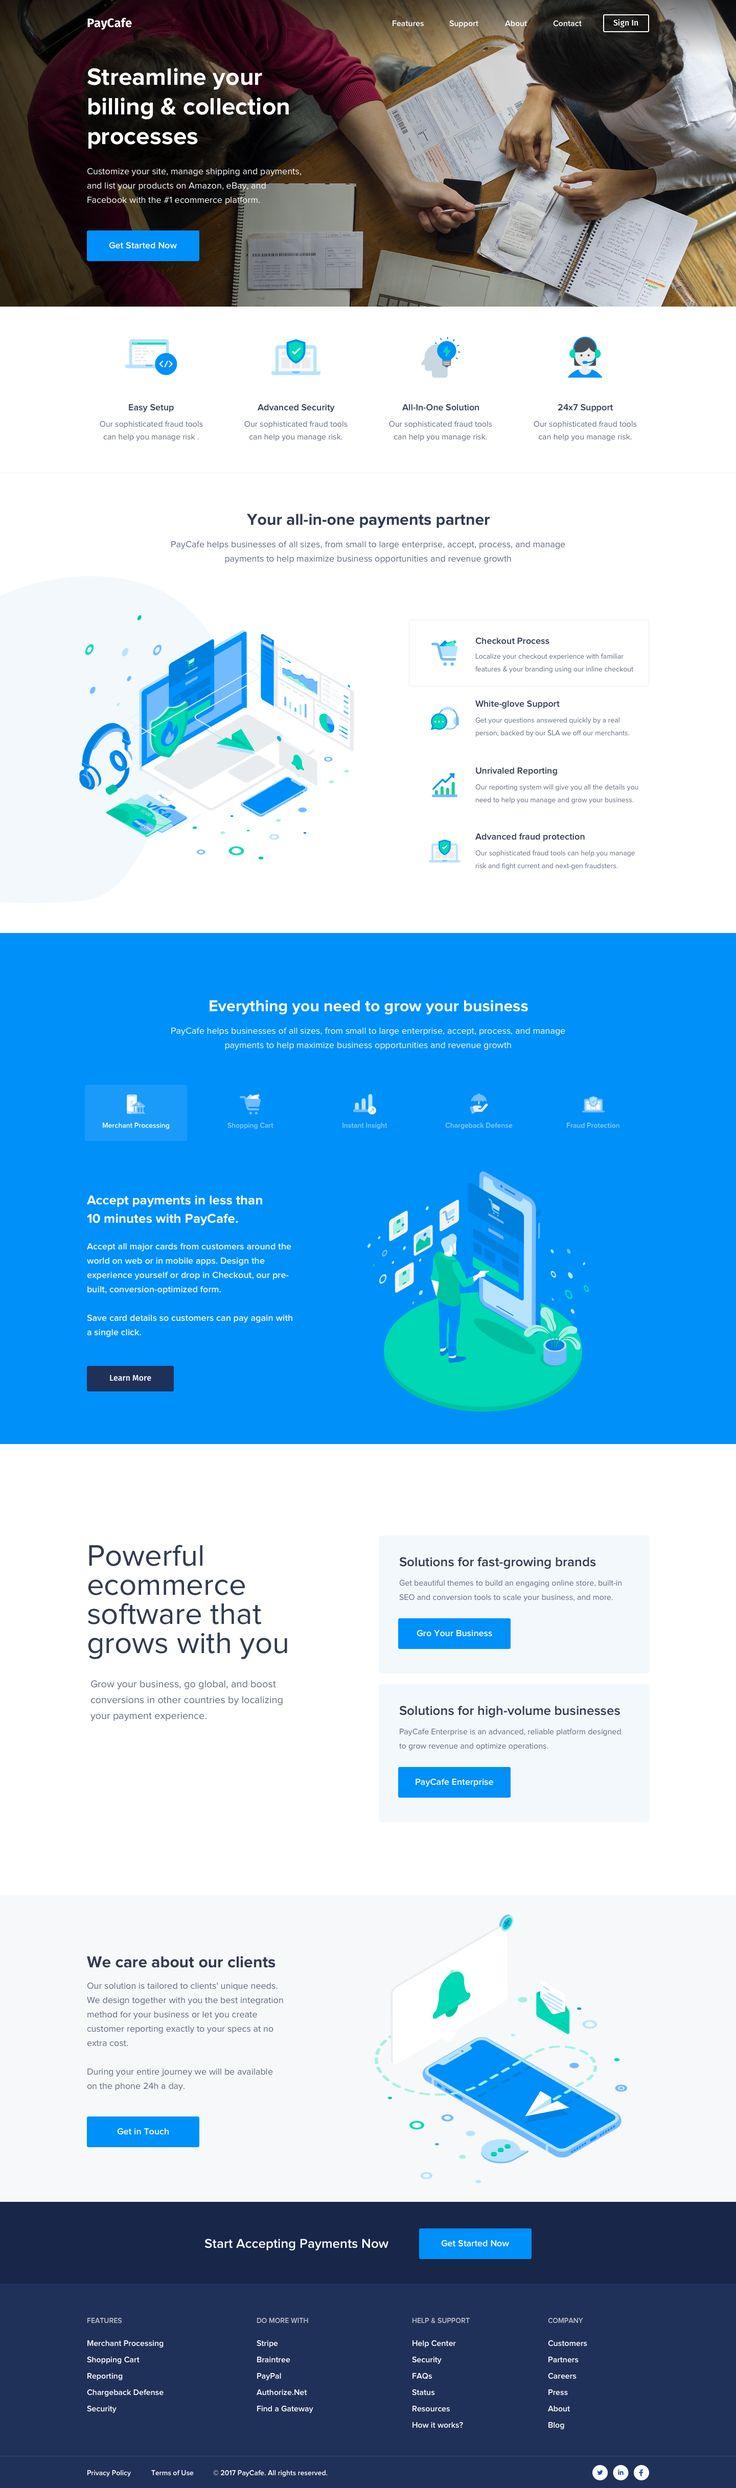 Payment Gateway Platform / Paresh Khatri